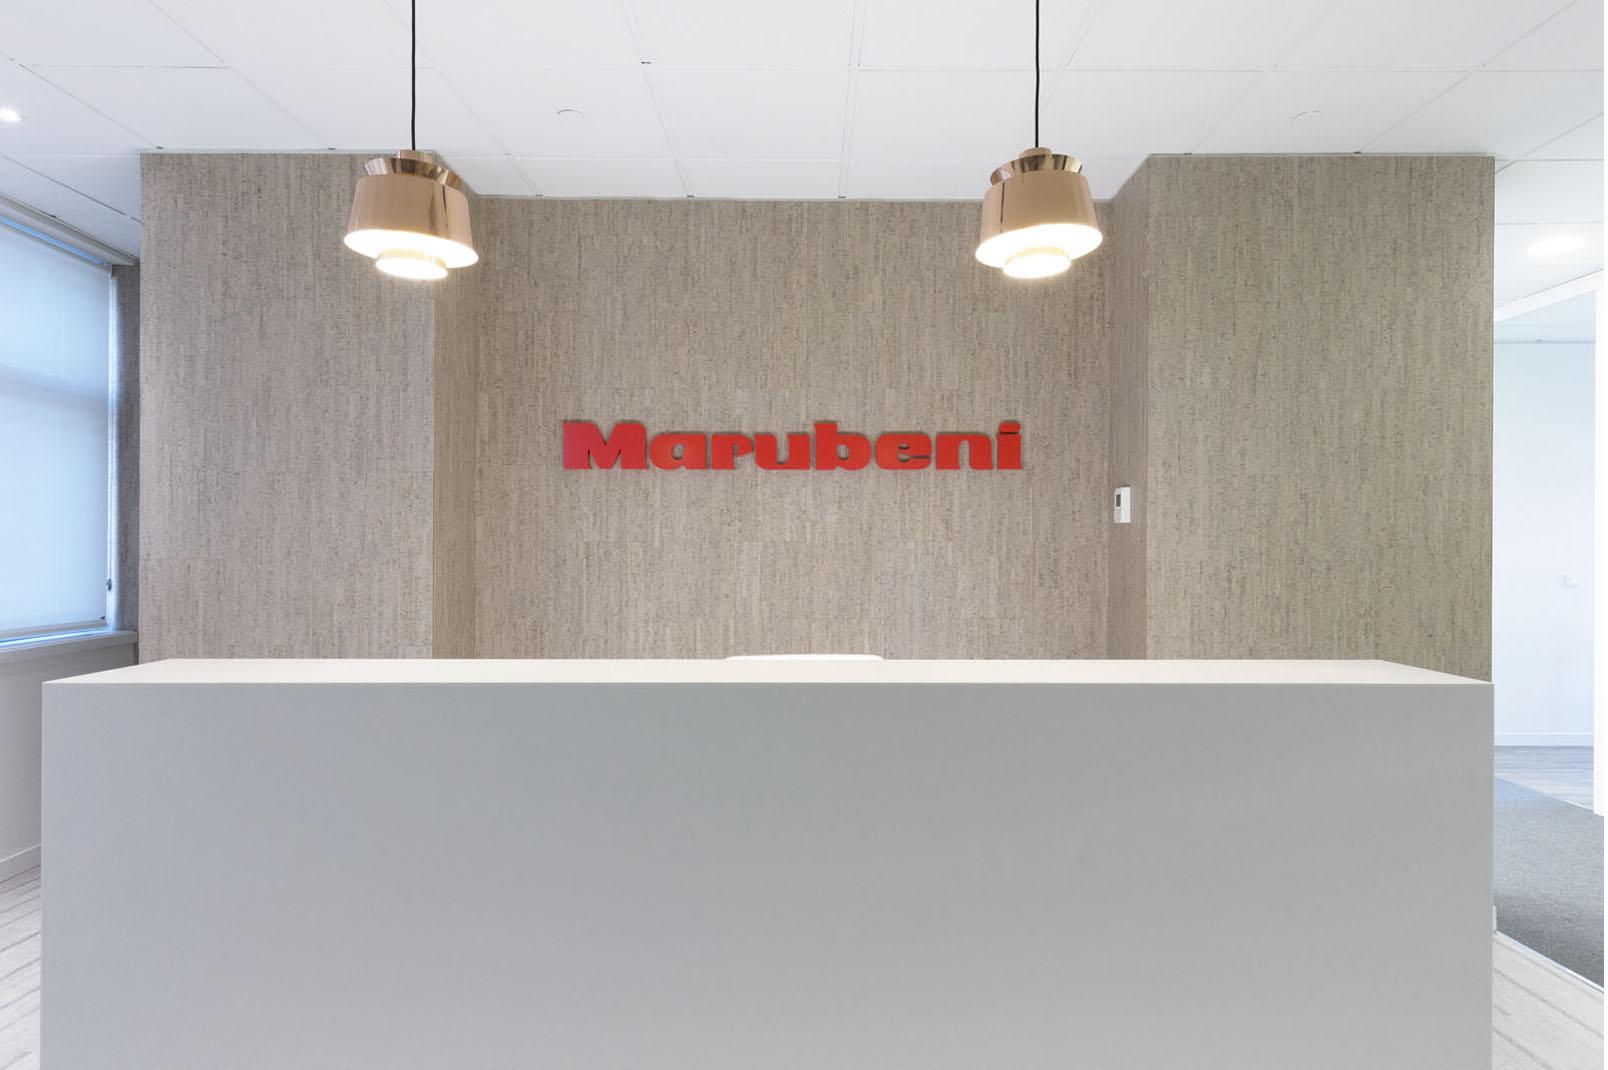 Marubeni_20170529_0021.jpg